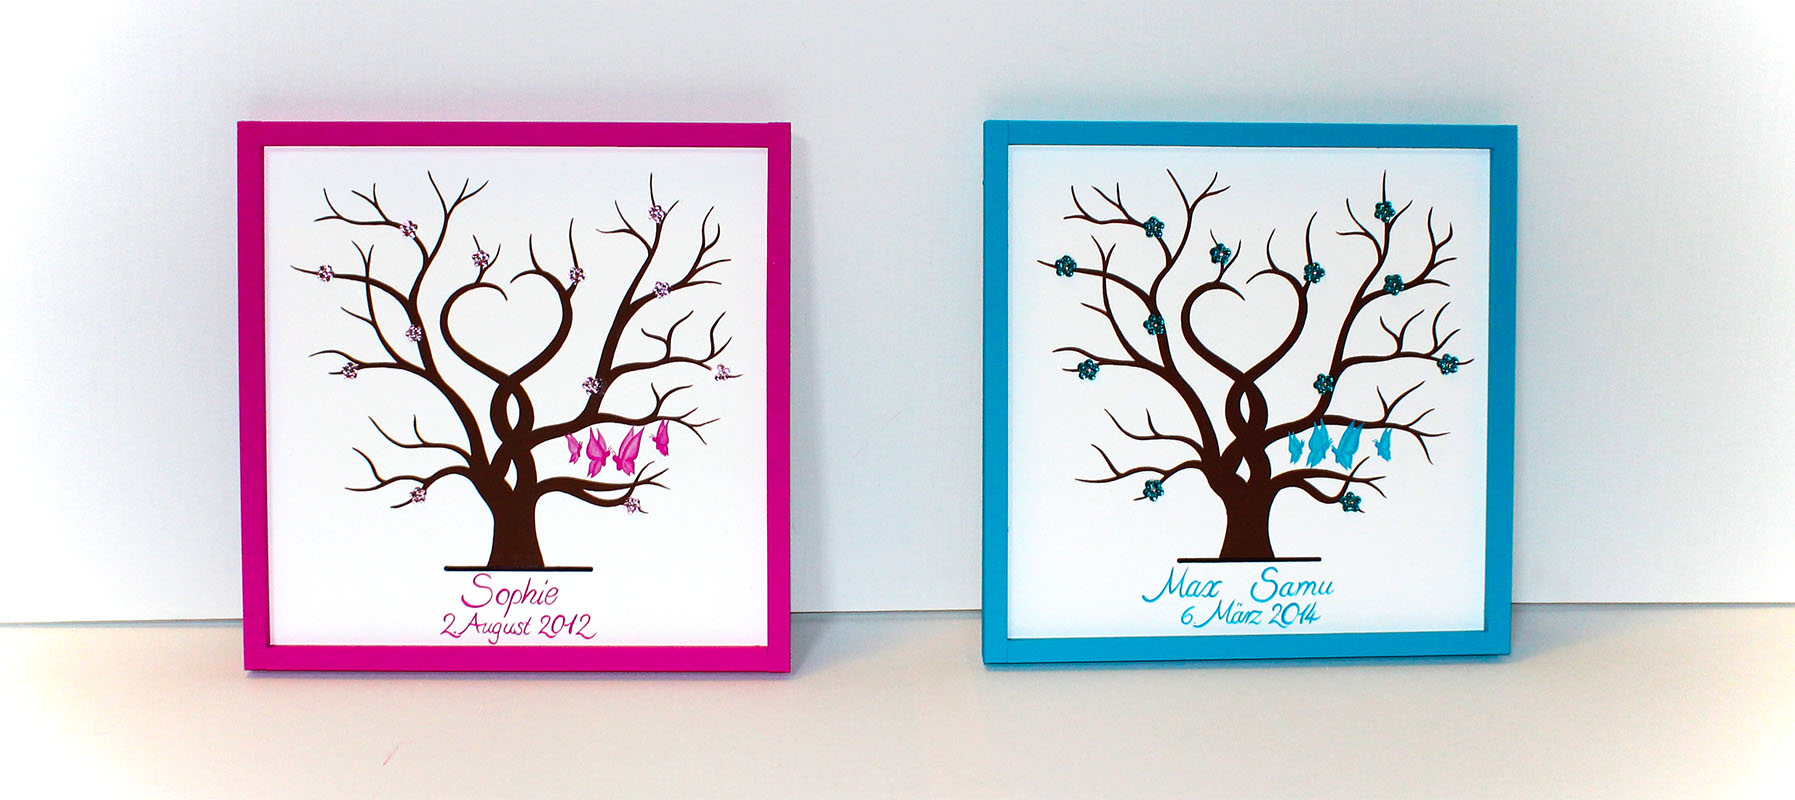 Geschwisterbäume